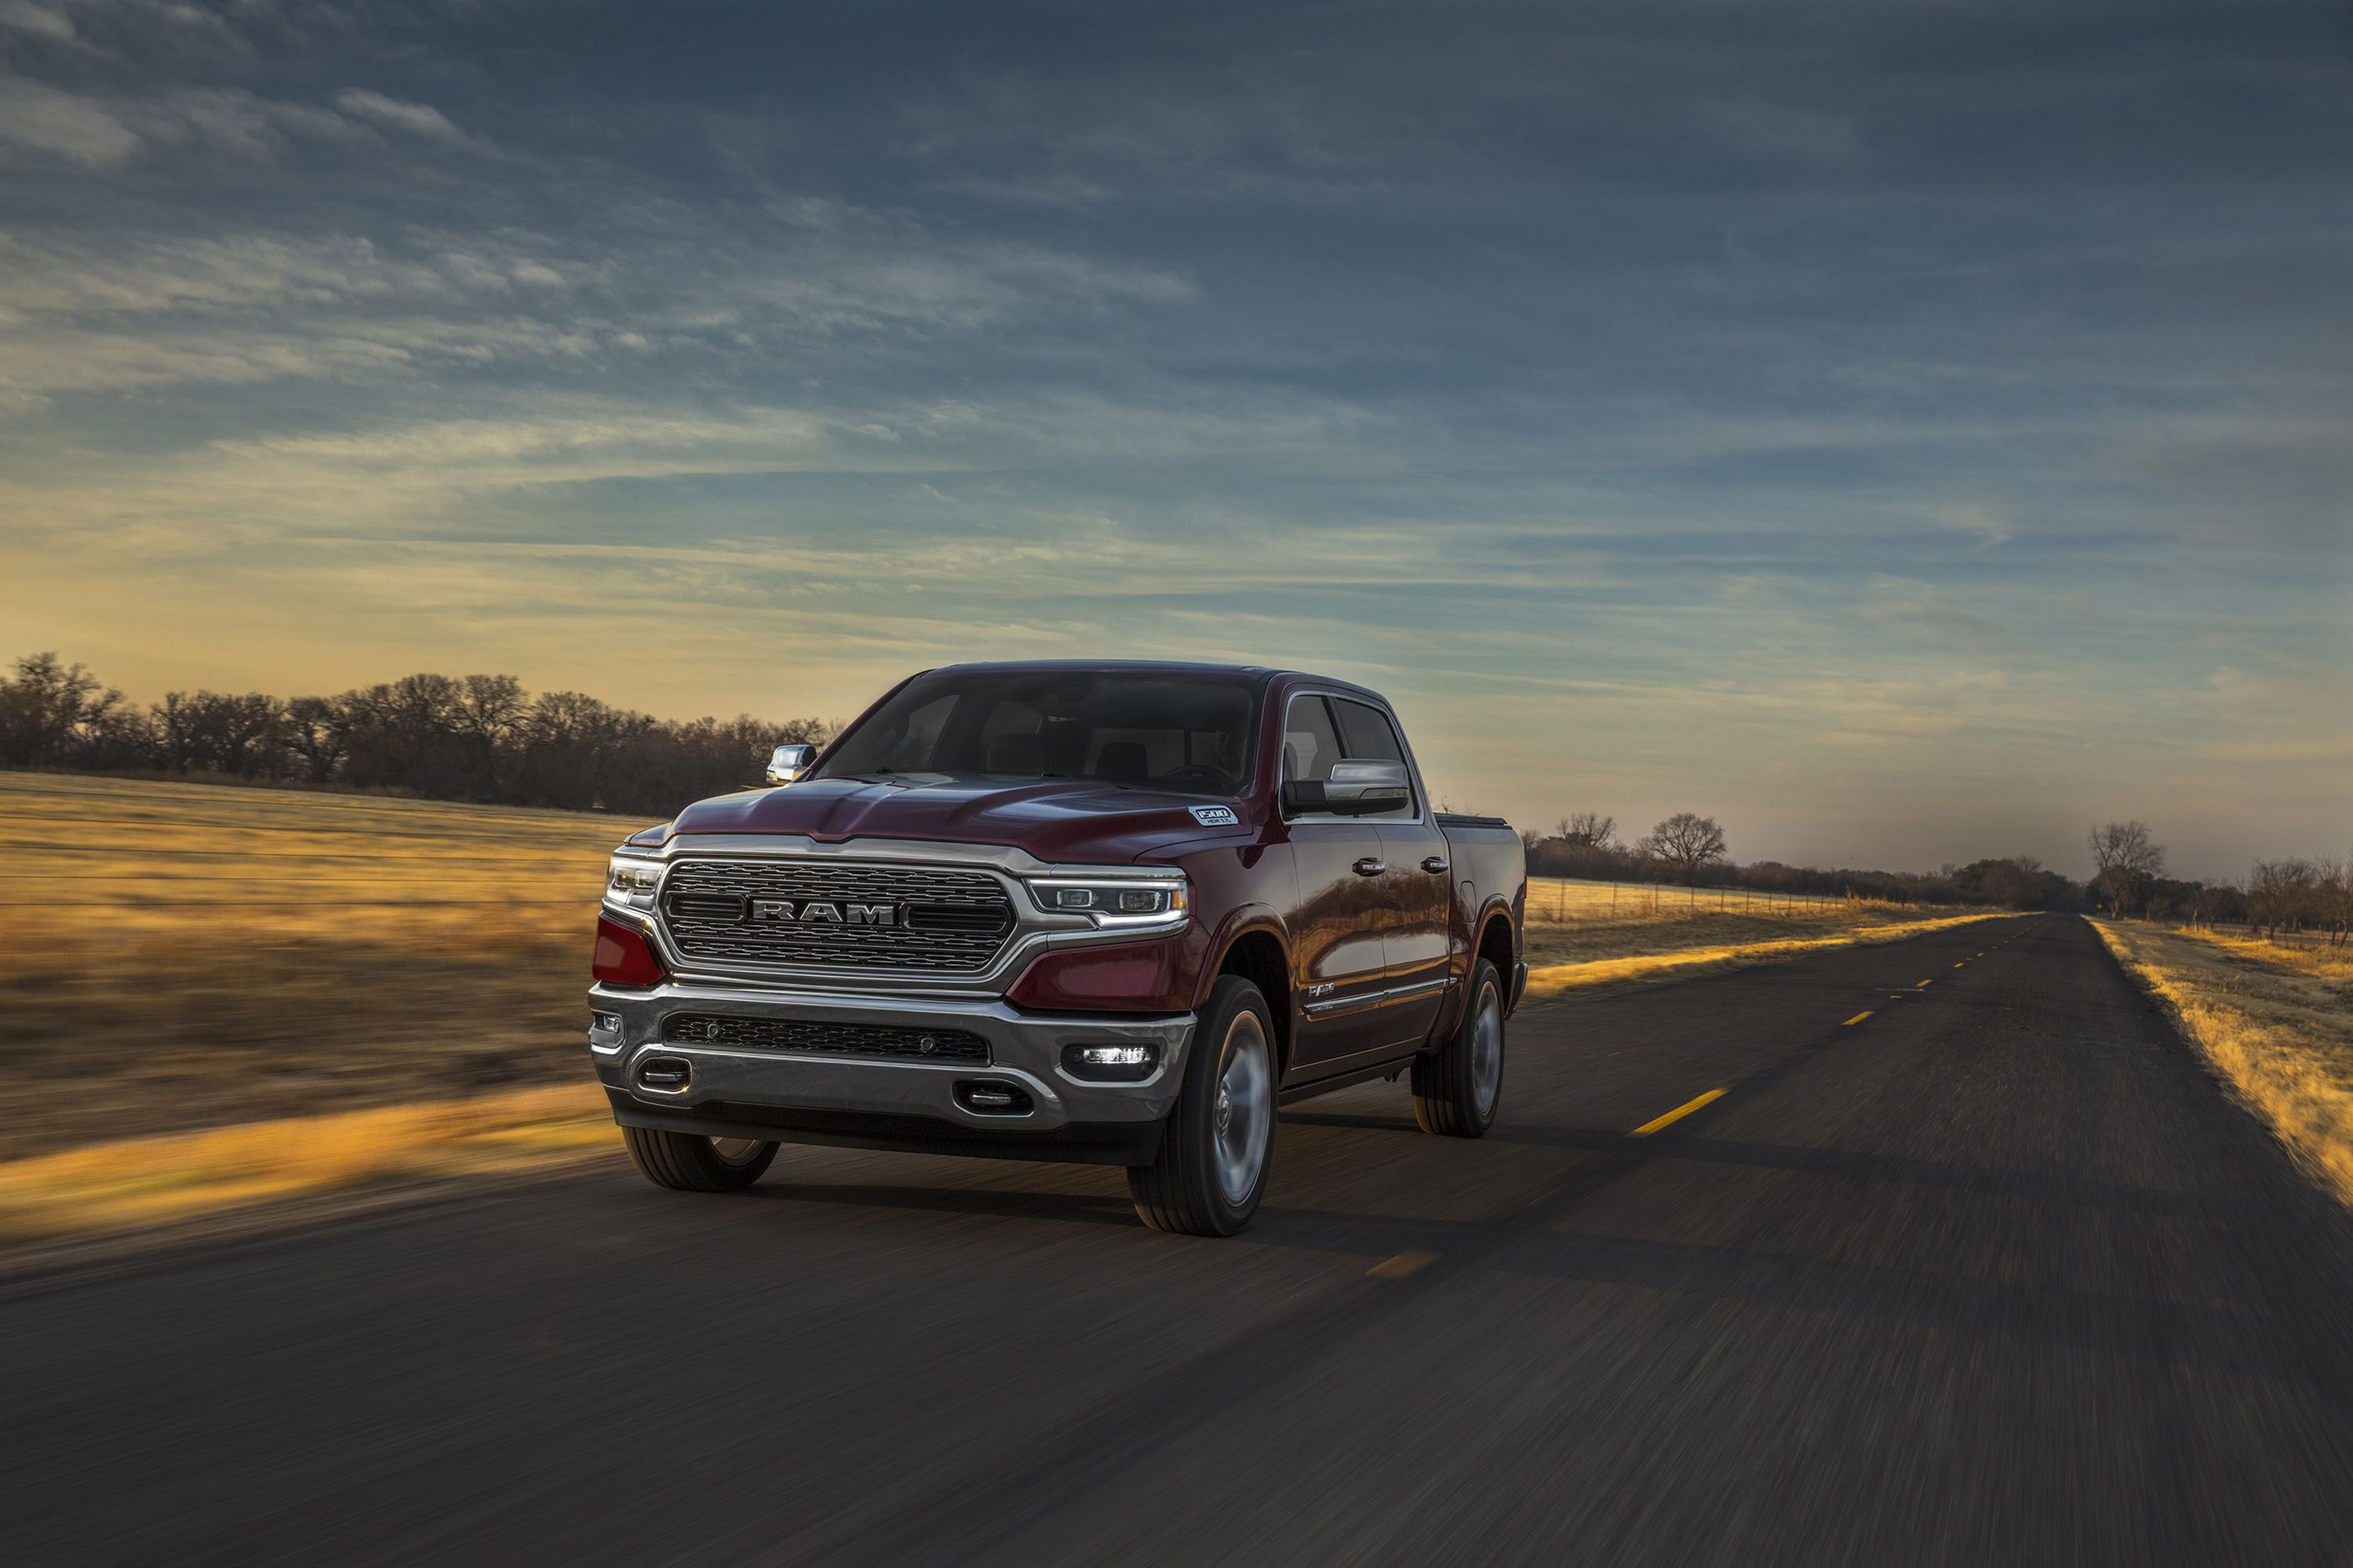 Image Result For 2019 Ram Dodge Truck Wallpaper Hd 2019 Ram 1500 Ram 1500 Dodge Ram Dodge ram wallpaper hd